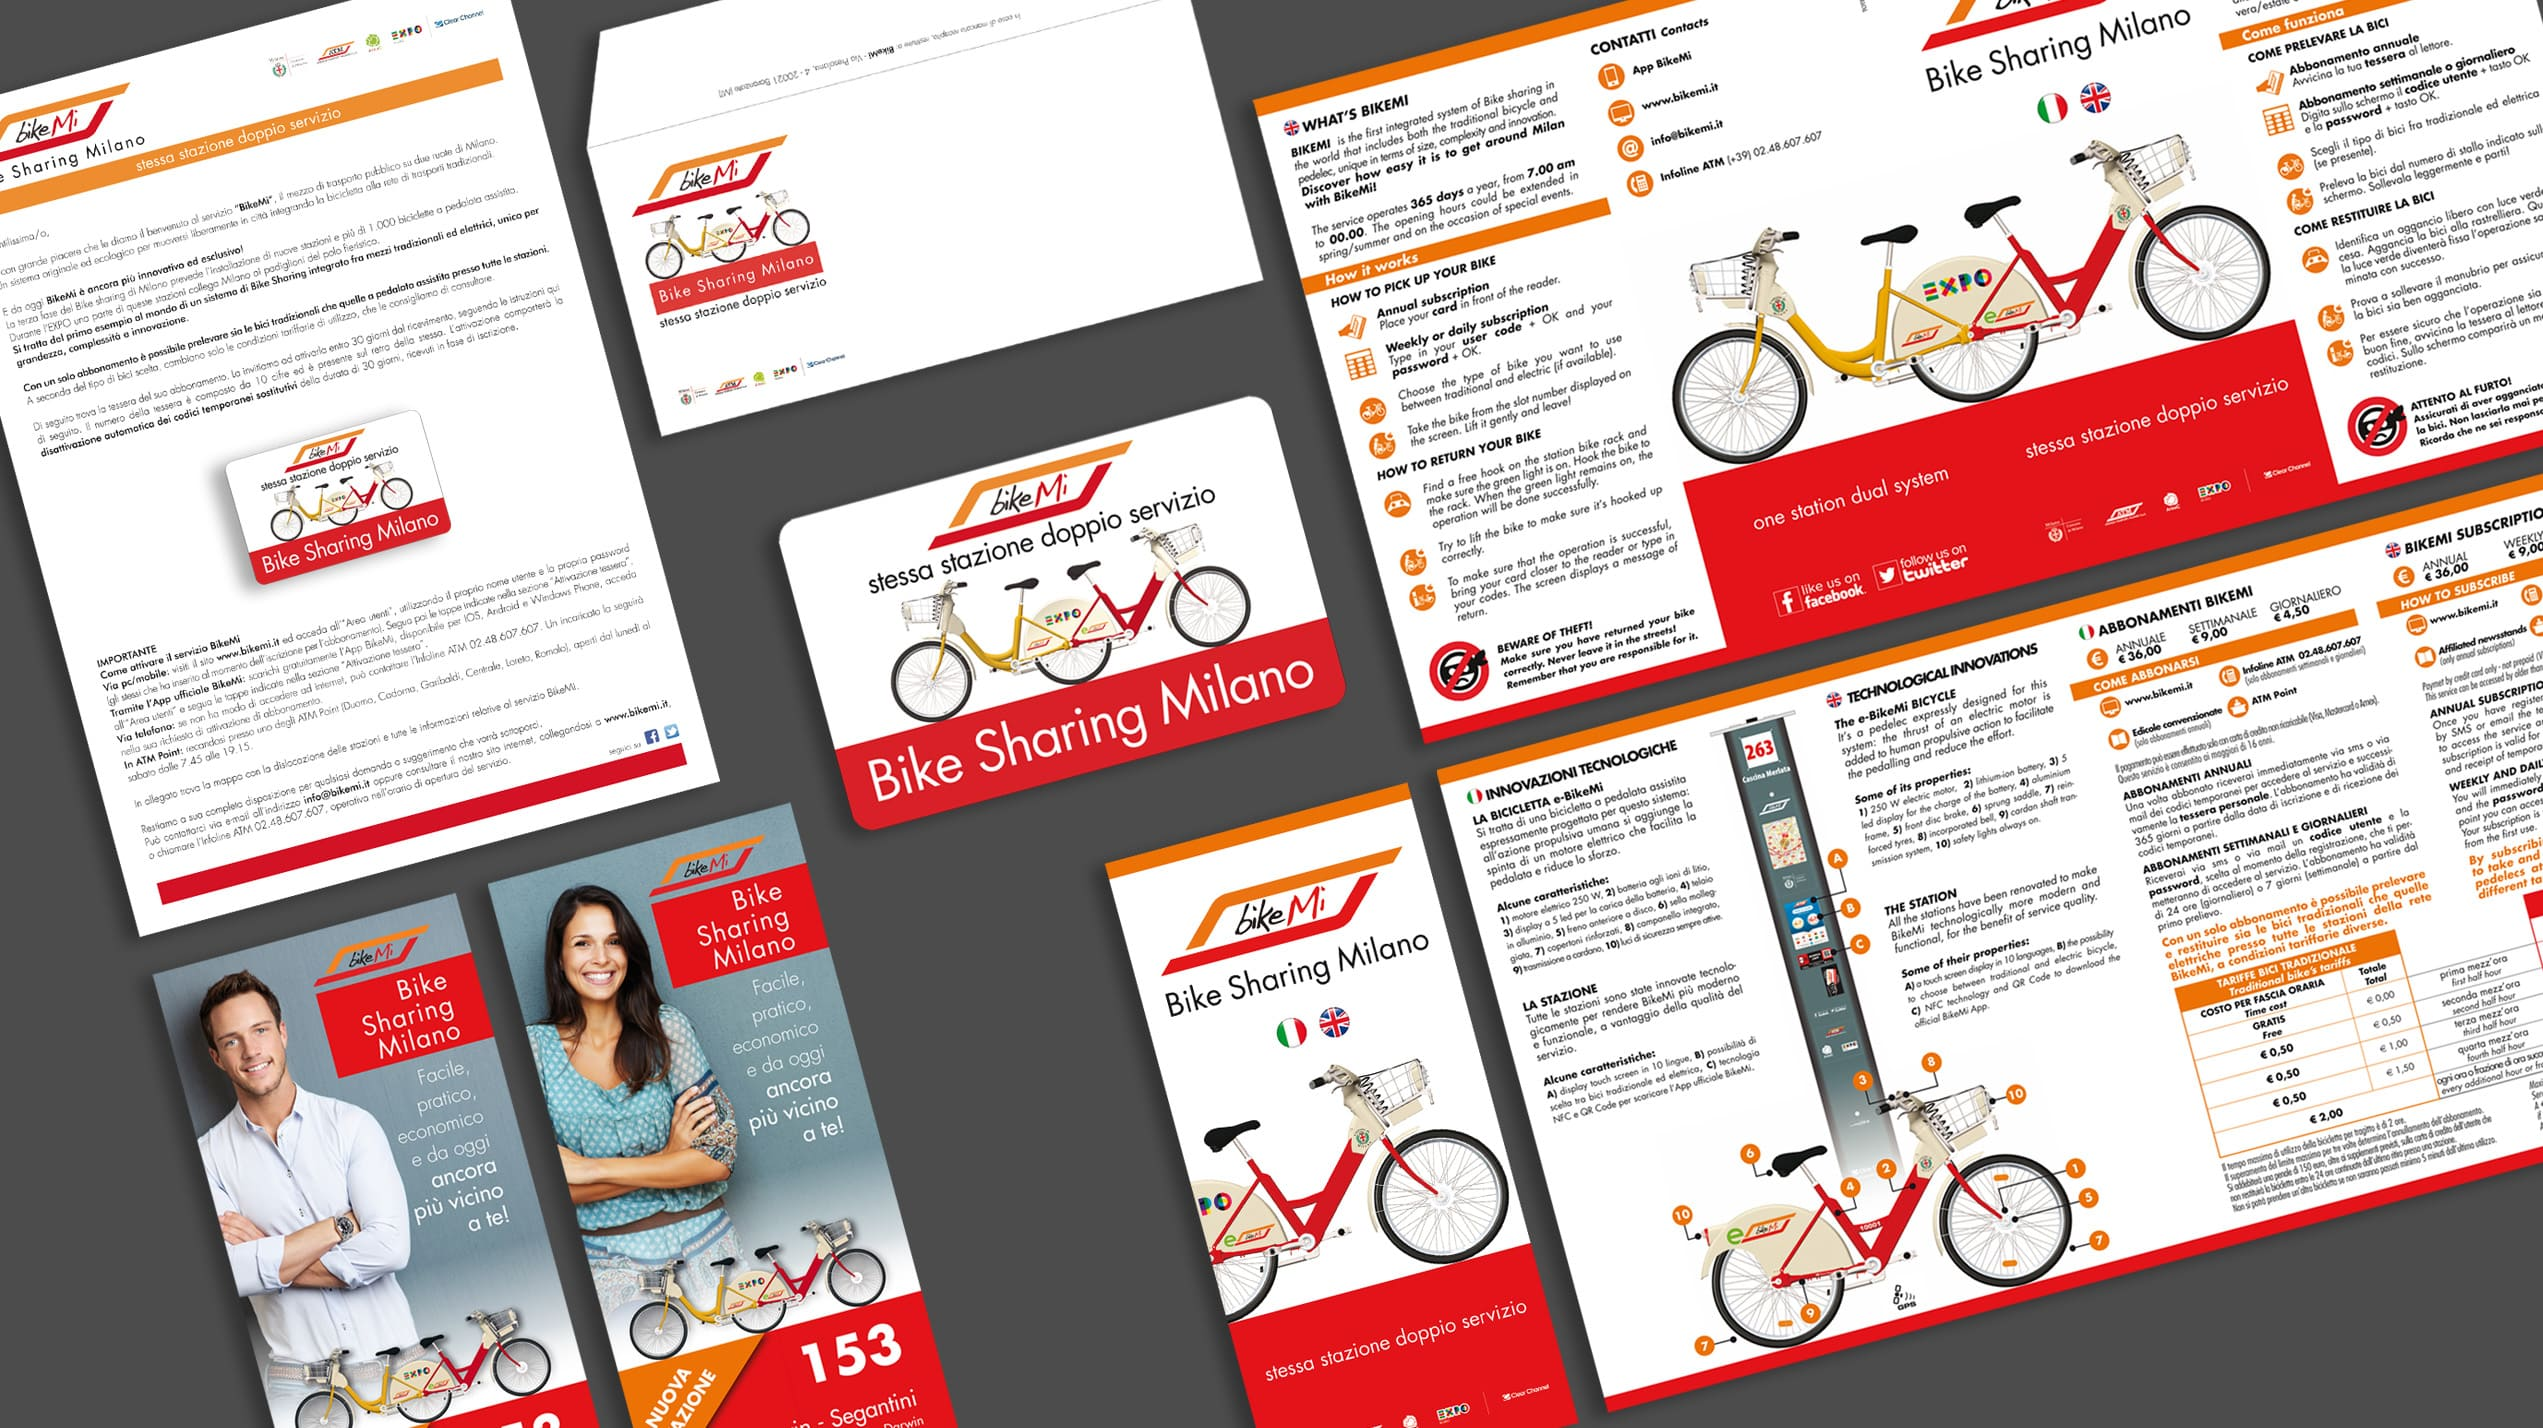 Immagine Coordinata BikeMi EXPO Milano